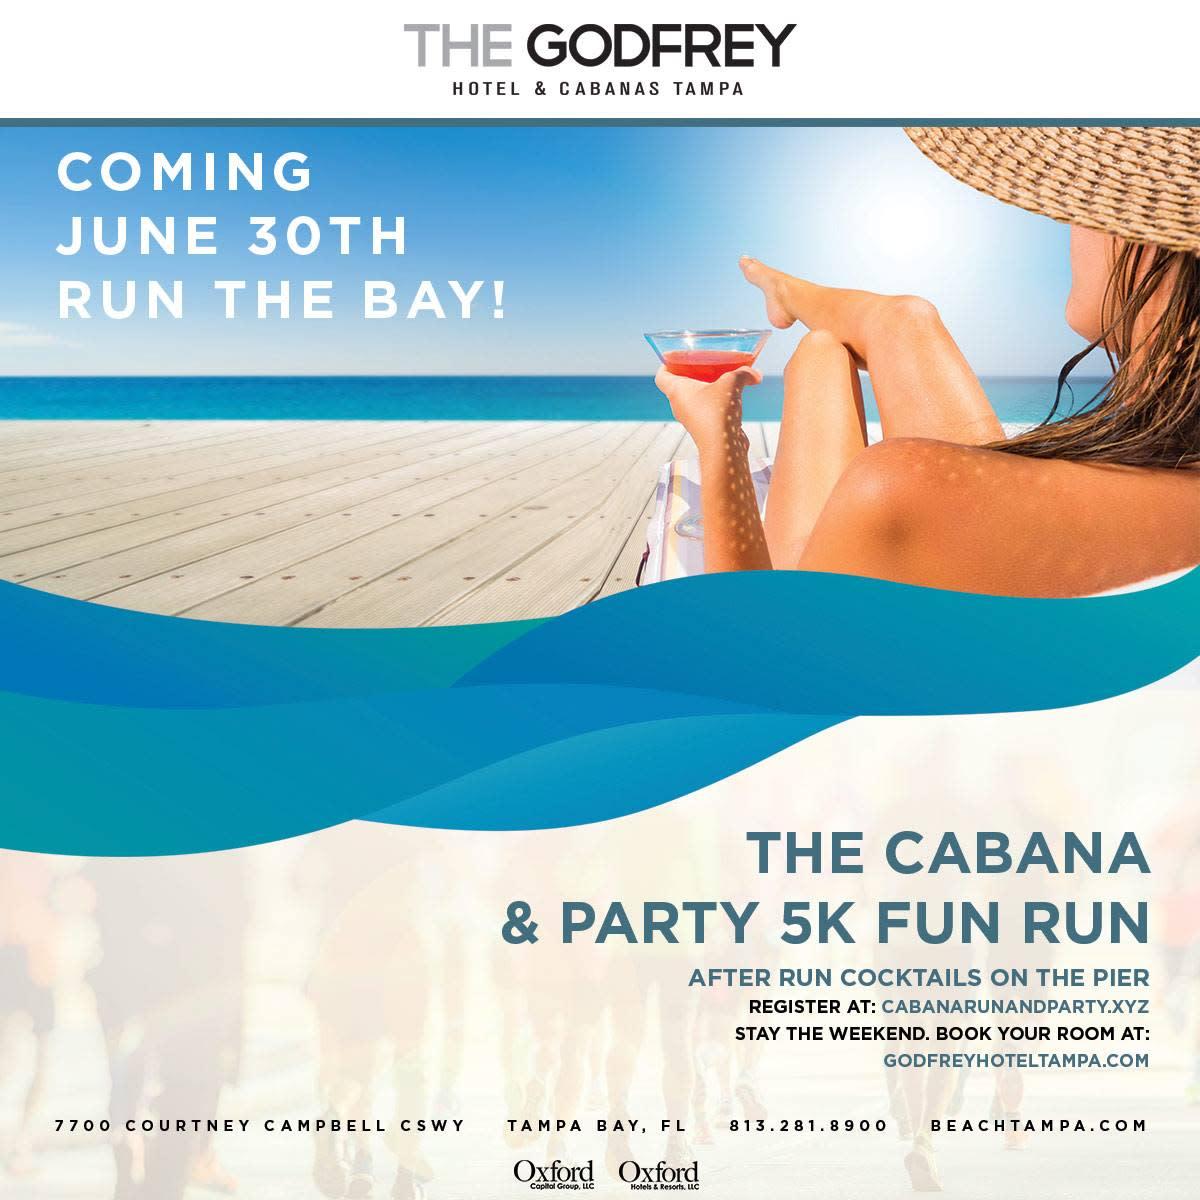 The Godfrey Hotel & Cabanas Party 5K Fun Run